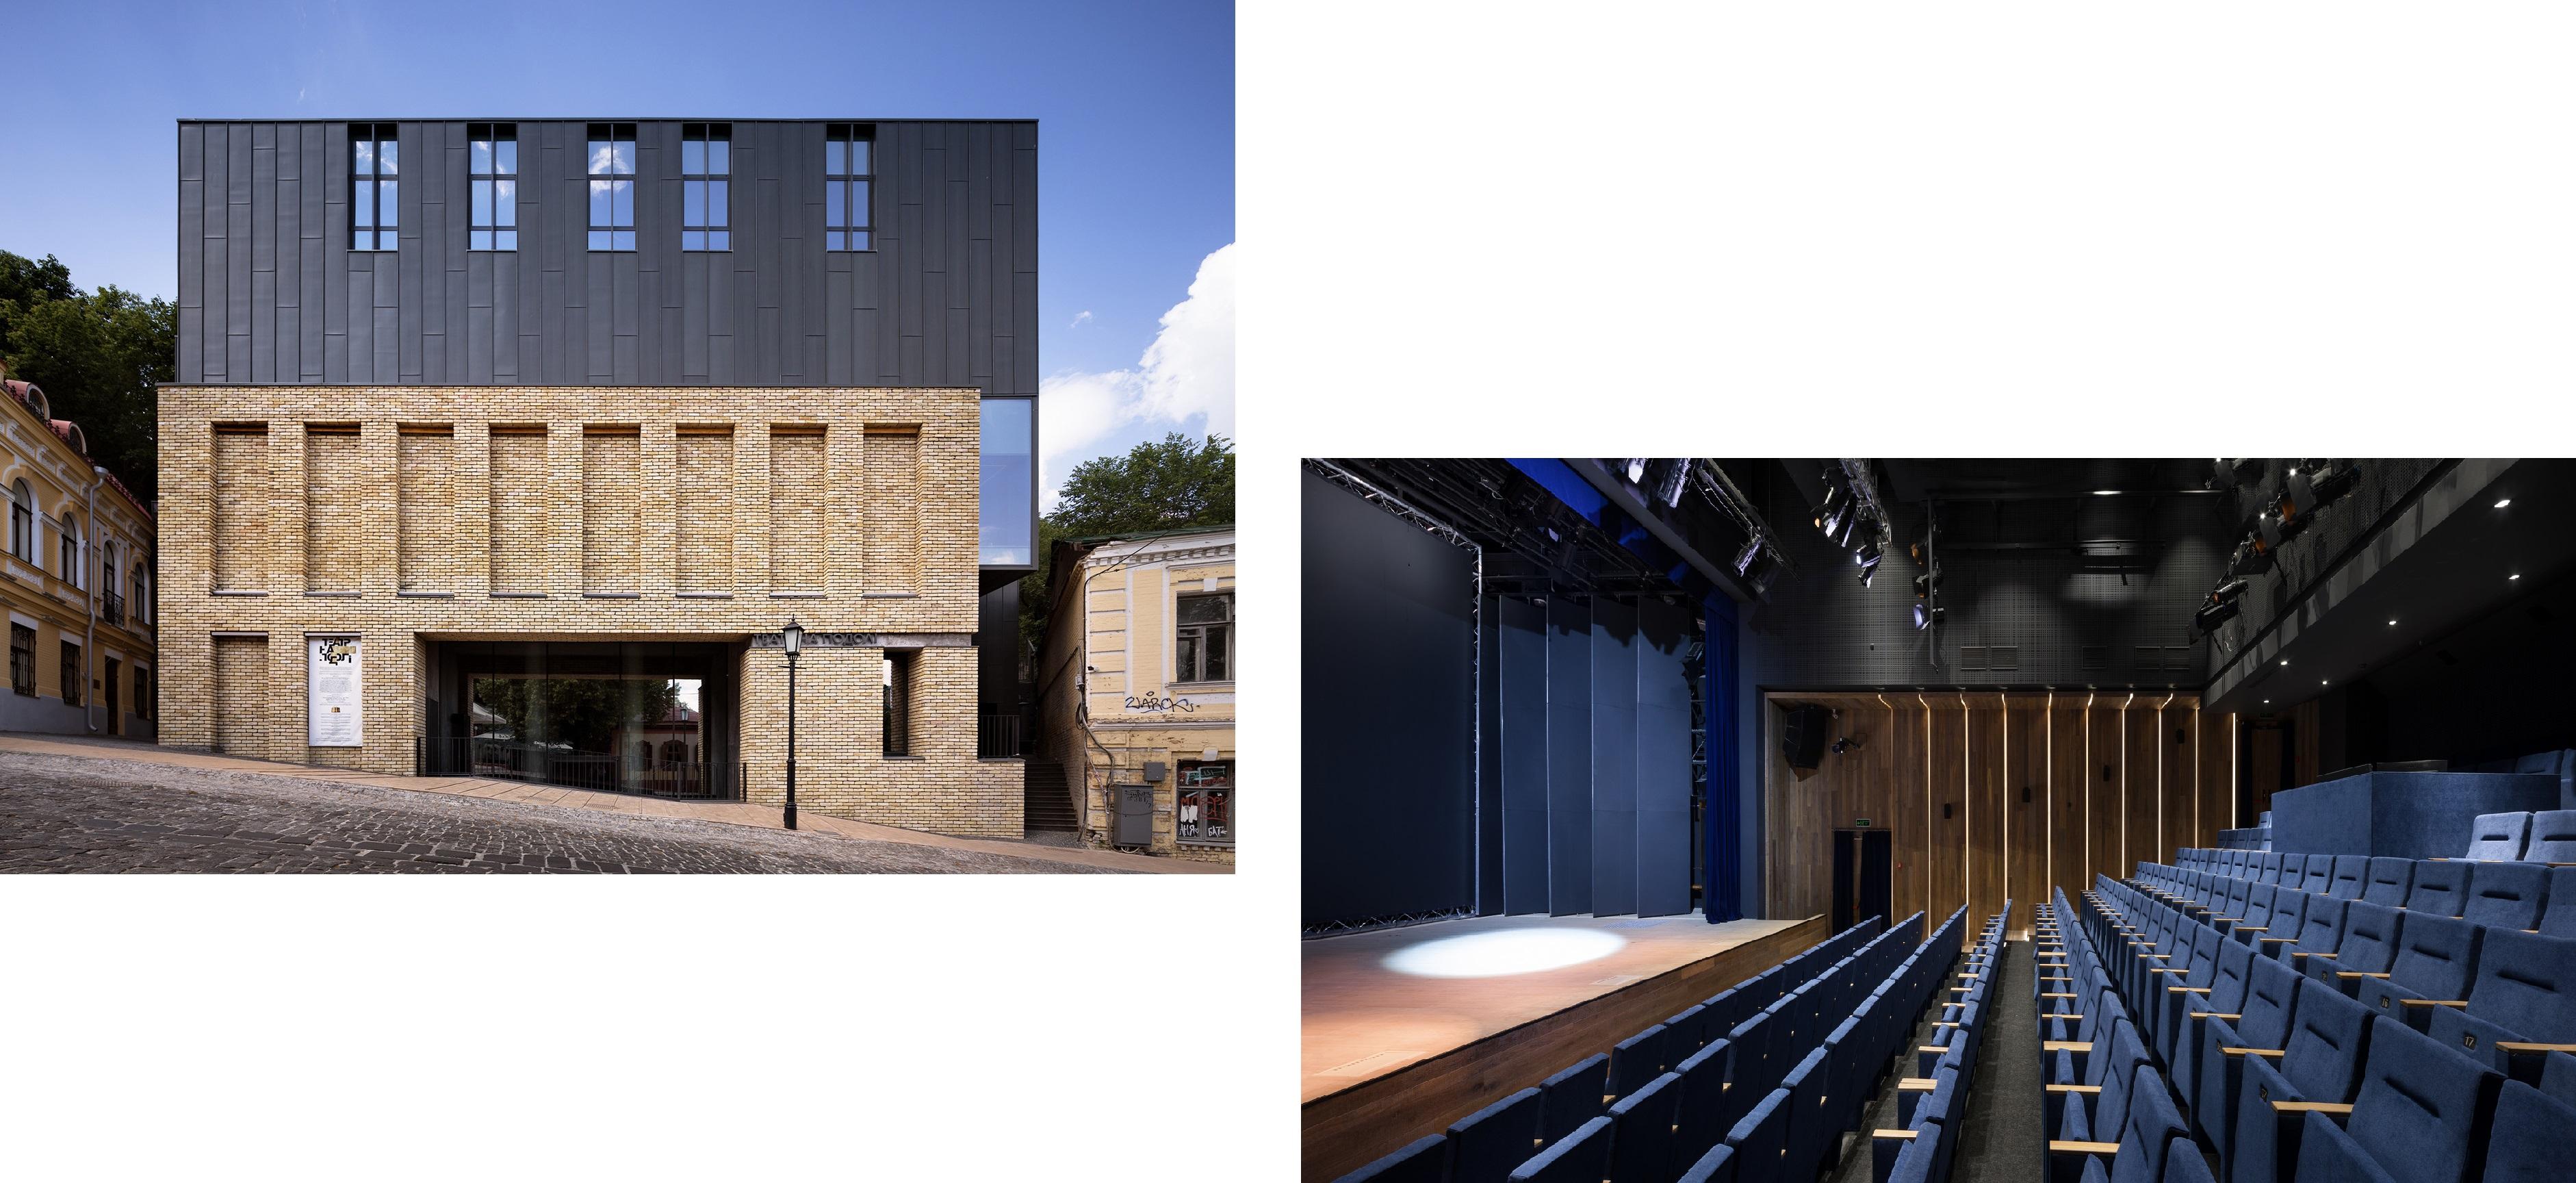 Театр на Подоле, коллаж LIGA.net, фото: Drozdov & Partners